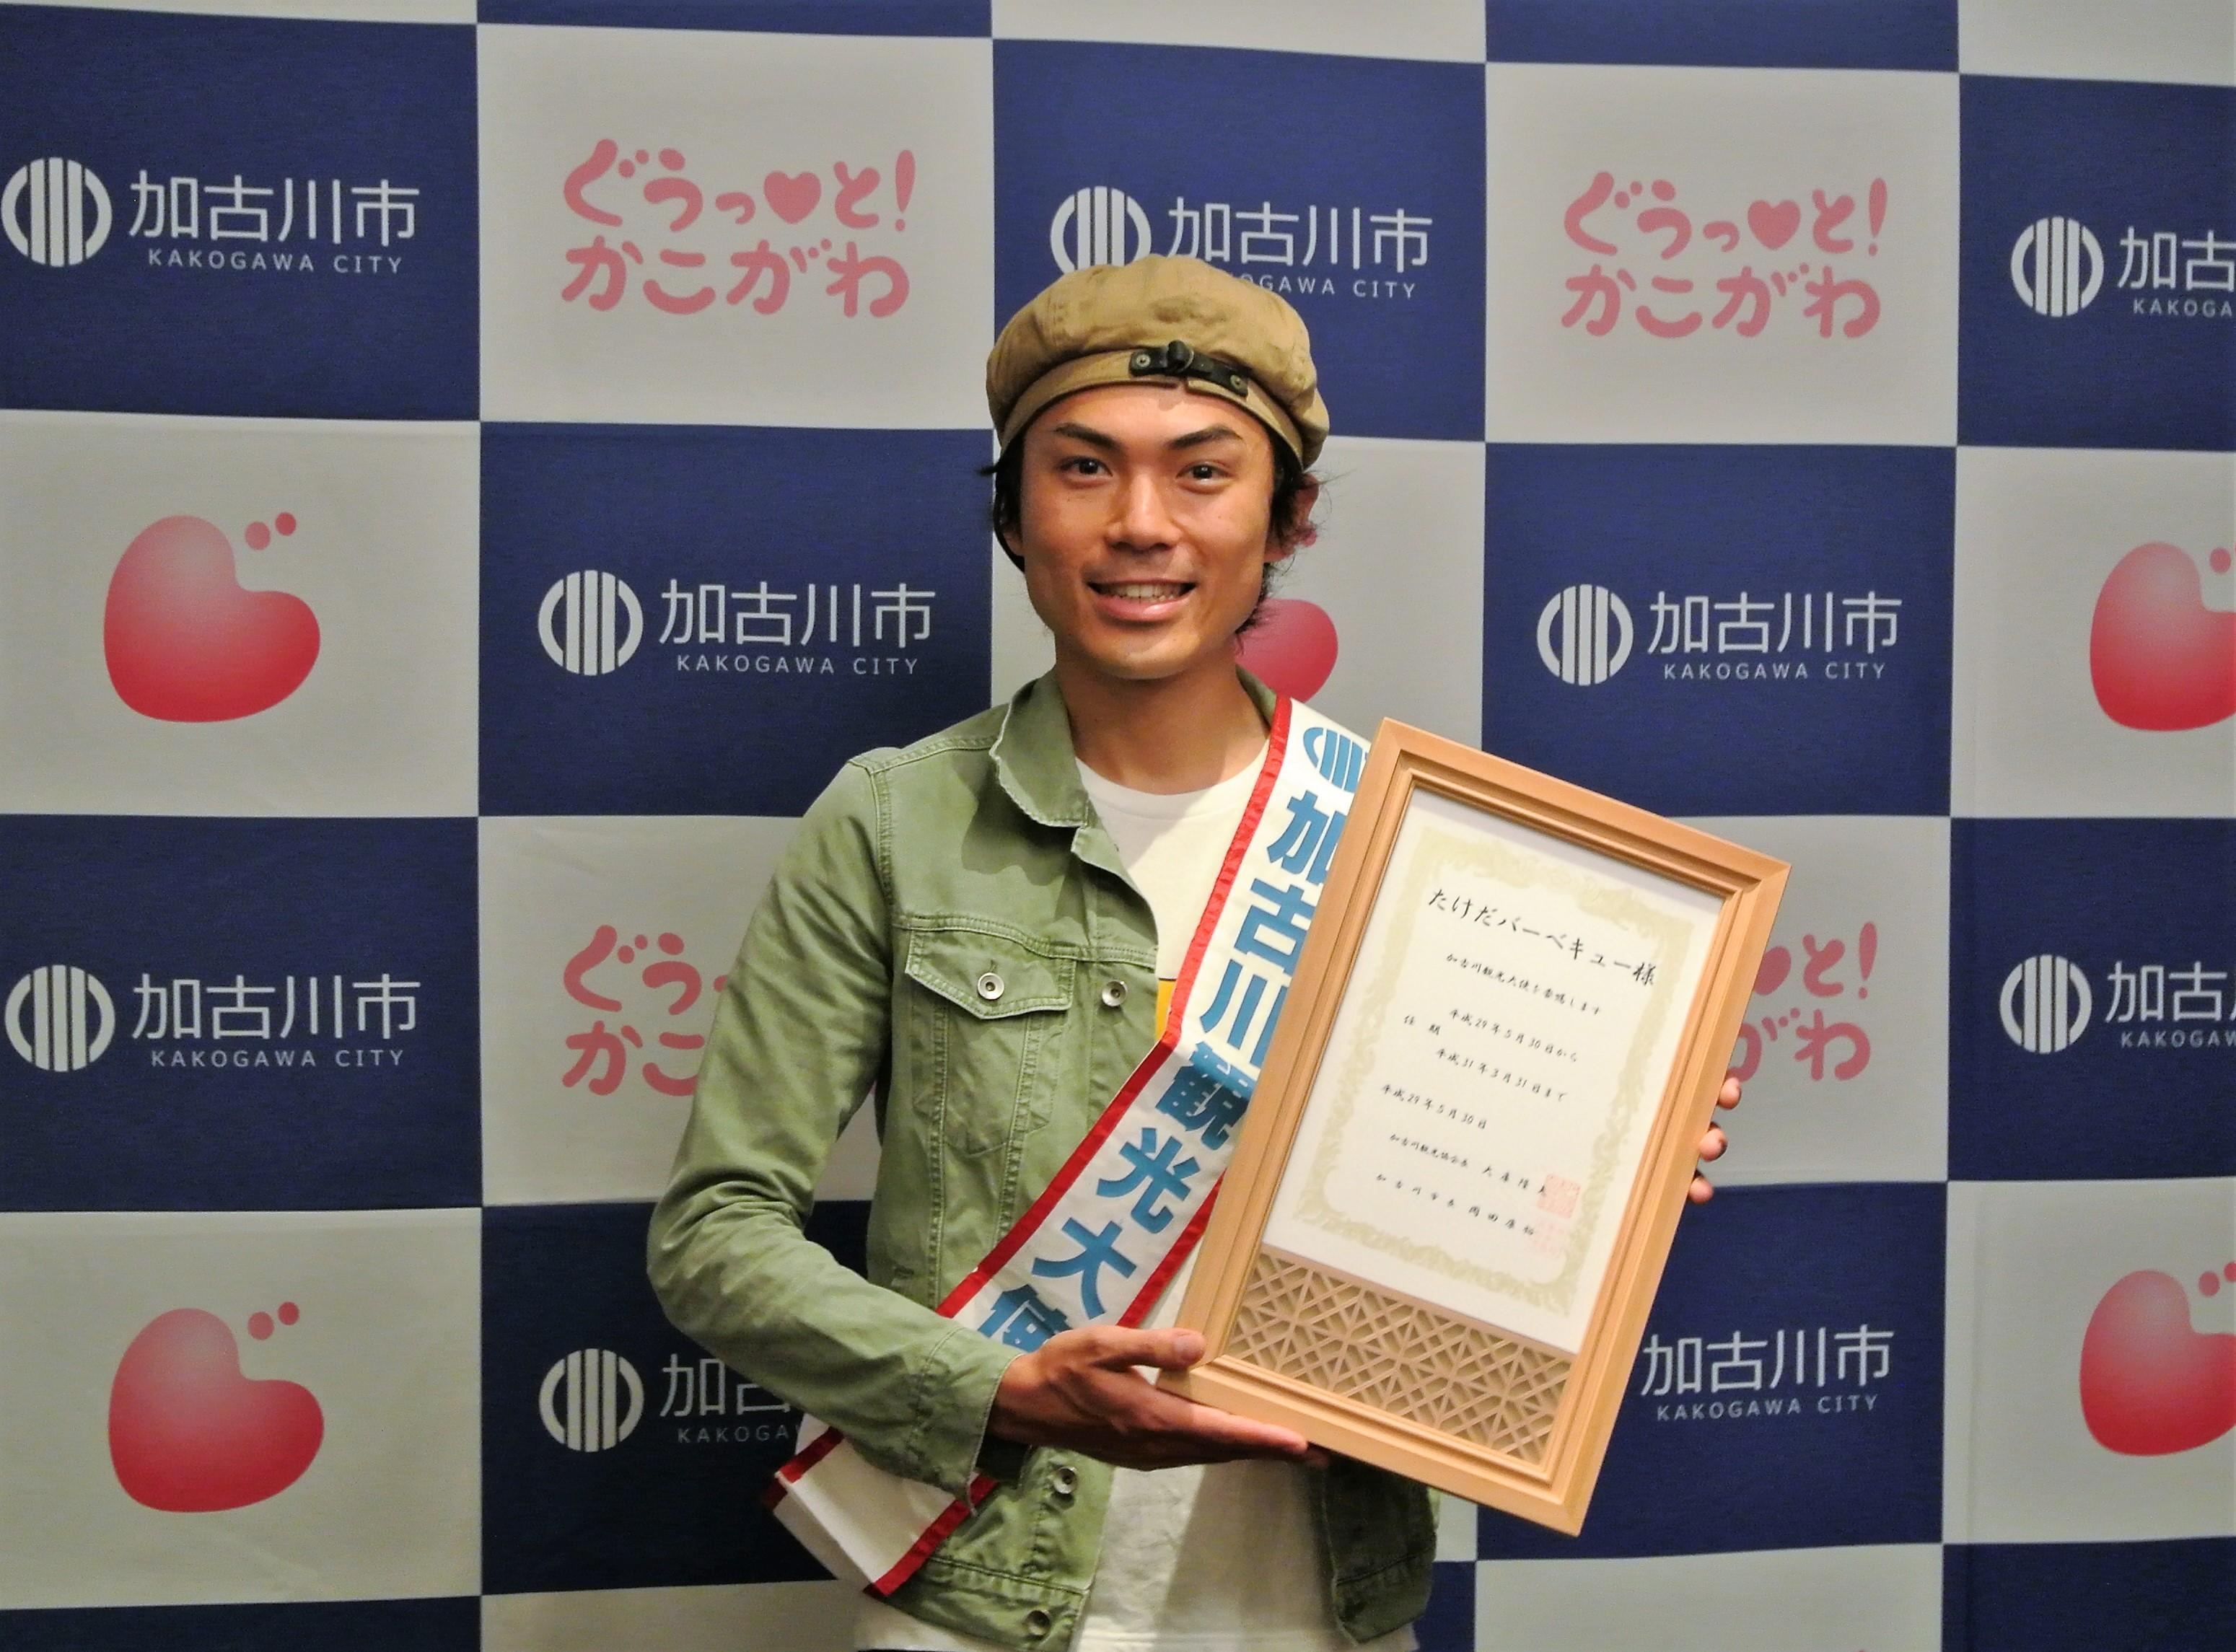 http://news.yoshimoto.co.jp/20170530202111-a4f2155bce57b0e6b82ea108a1d06c1c5894333b.jpg